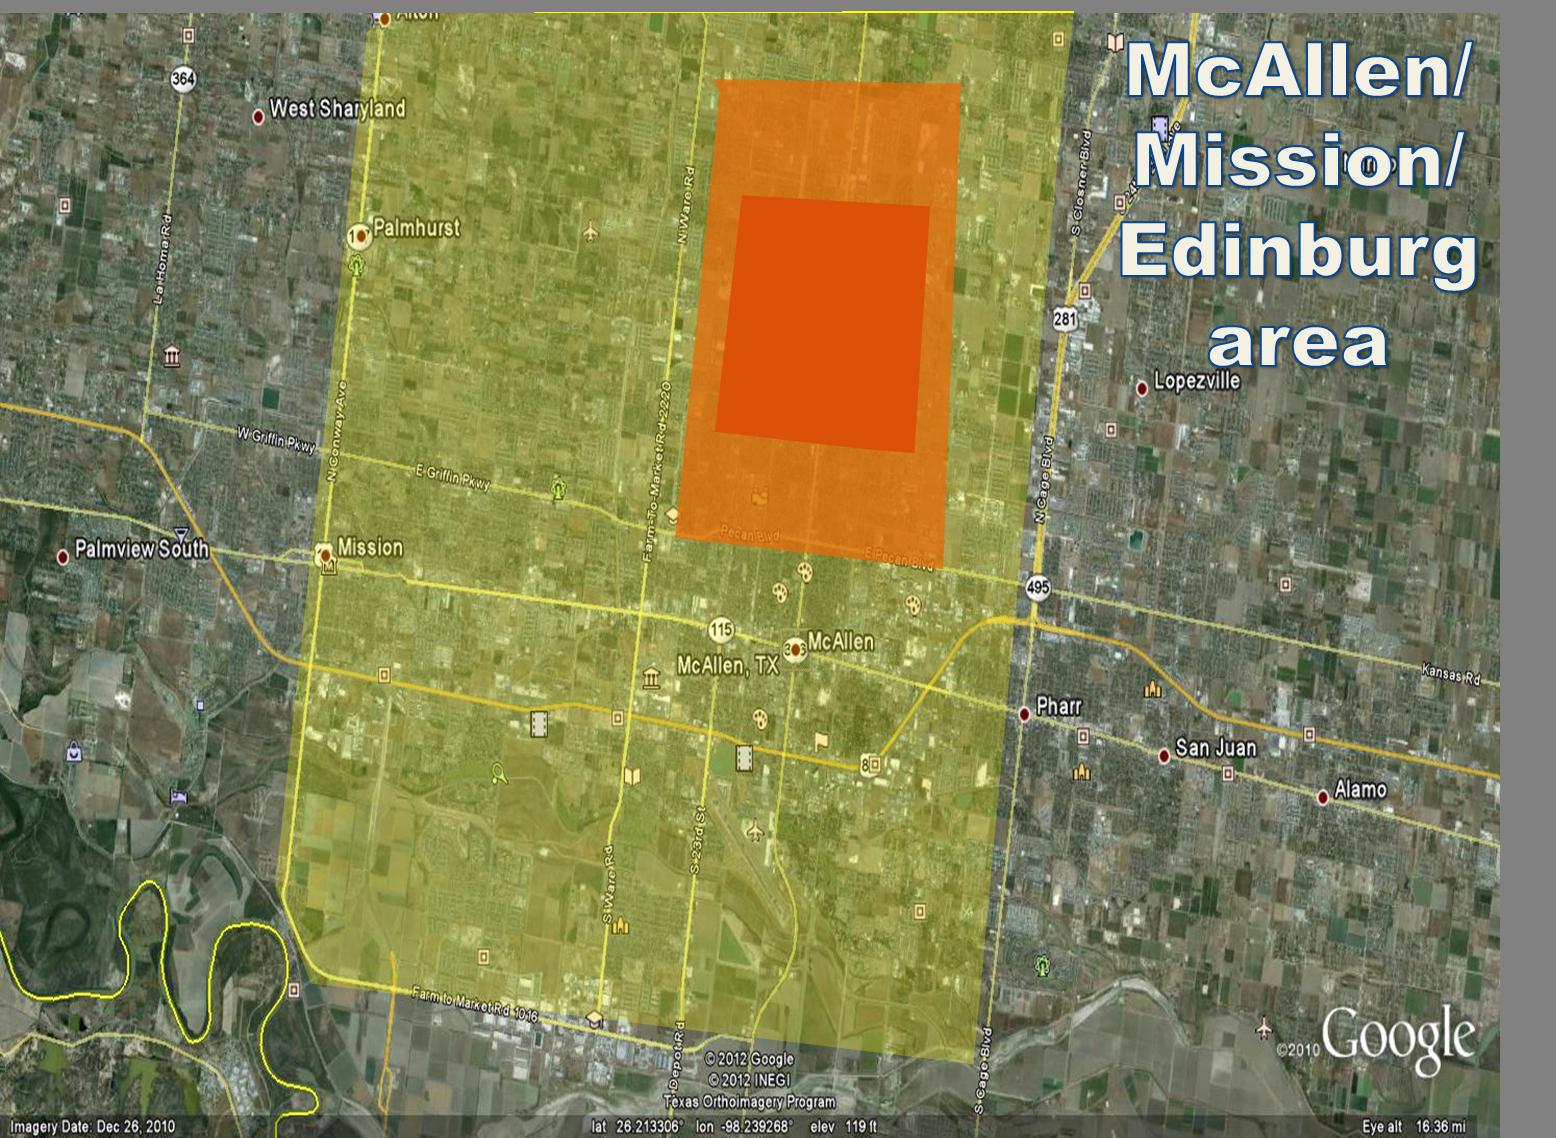 Preliminary Report On Mcallen Edinburg Mission Hailstorm March 29 2012